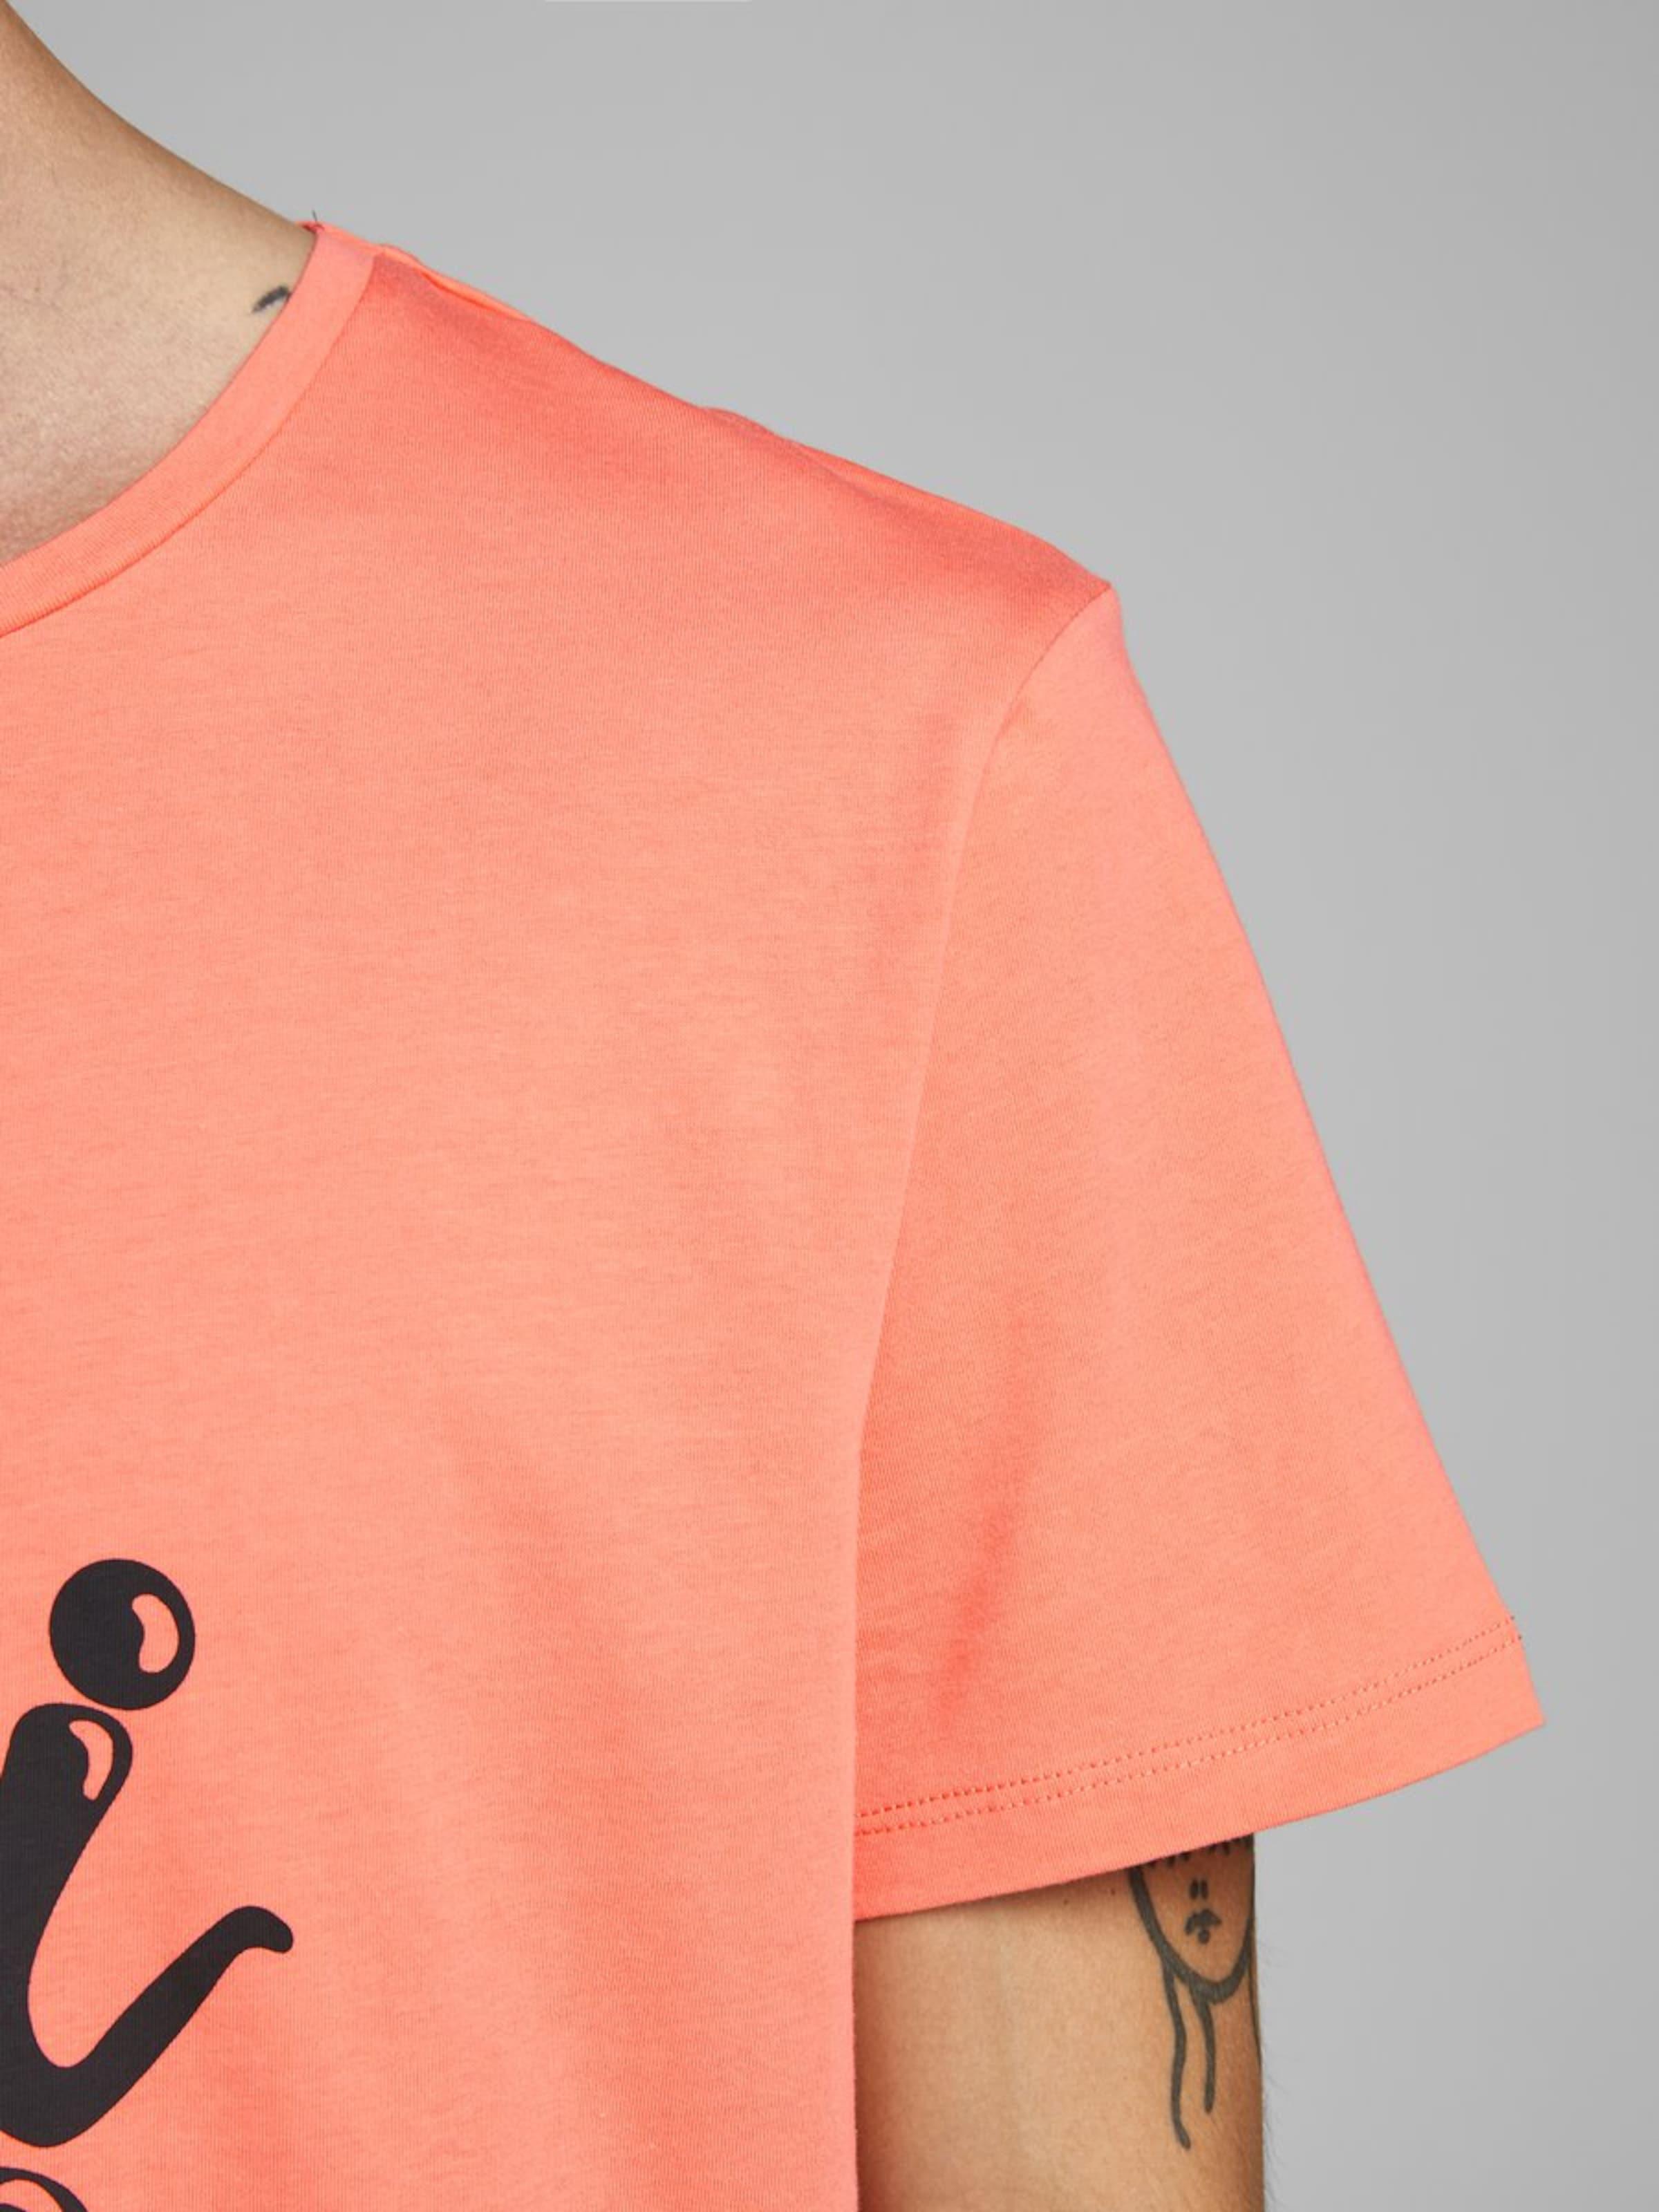 Jones shirt In Schwarz HellgrünLachs T Jackamp; vYybgIf76